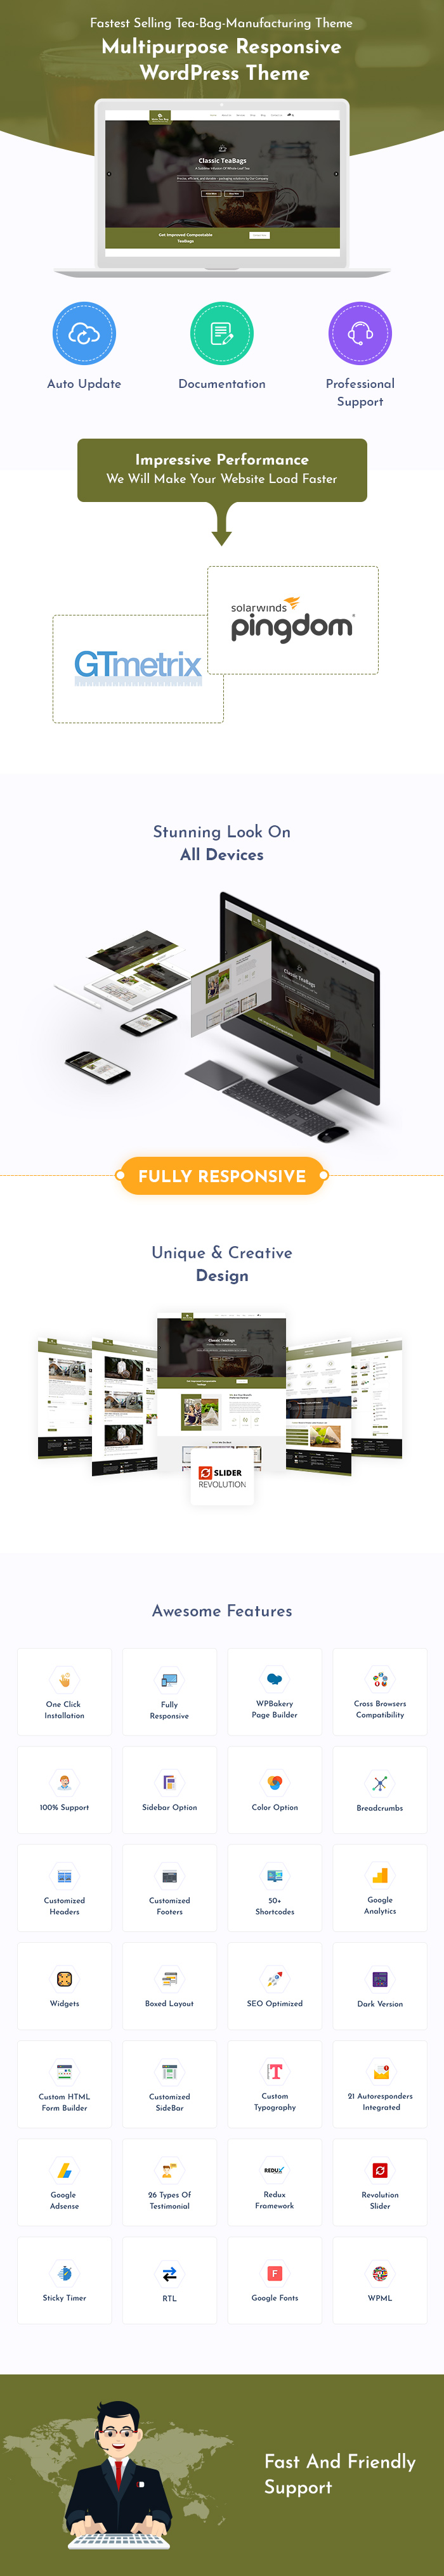 Tea Bag Manufacturing WordPress Themes